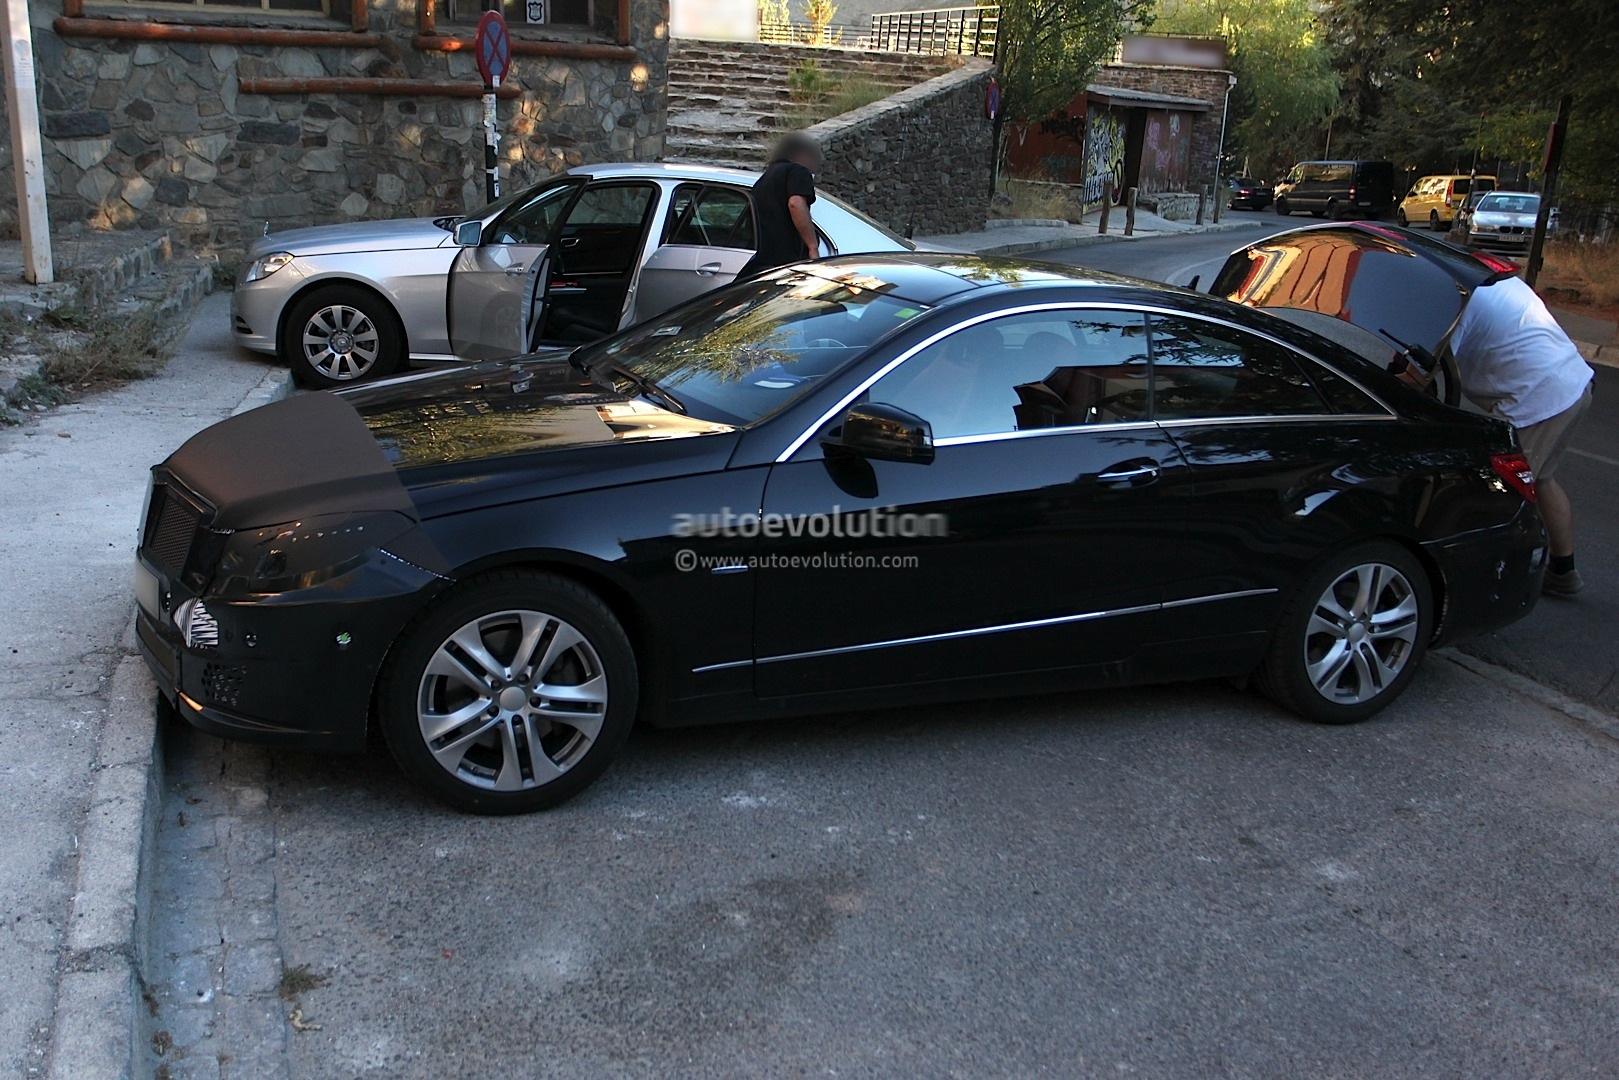 Spyshots 2014 mercedes e class coupe facelift with less camo autoevolution - Mercedes e class coupe 2014 ...